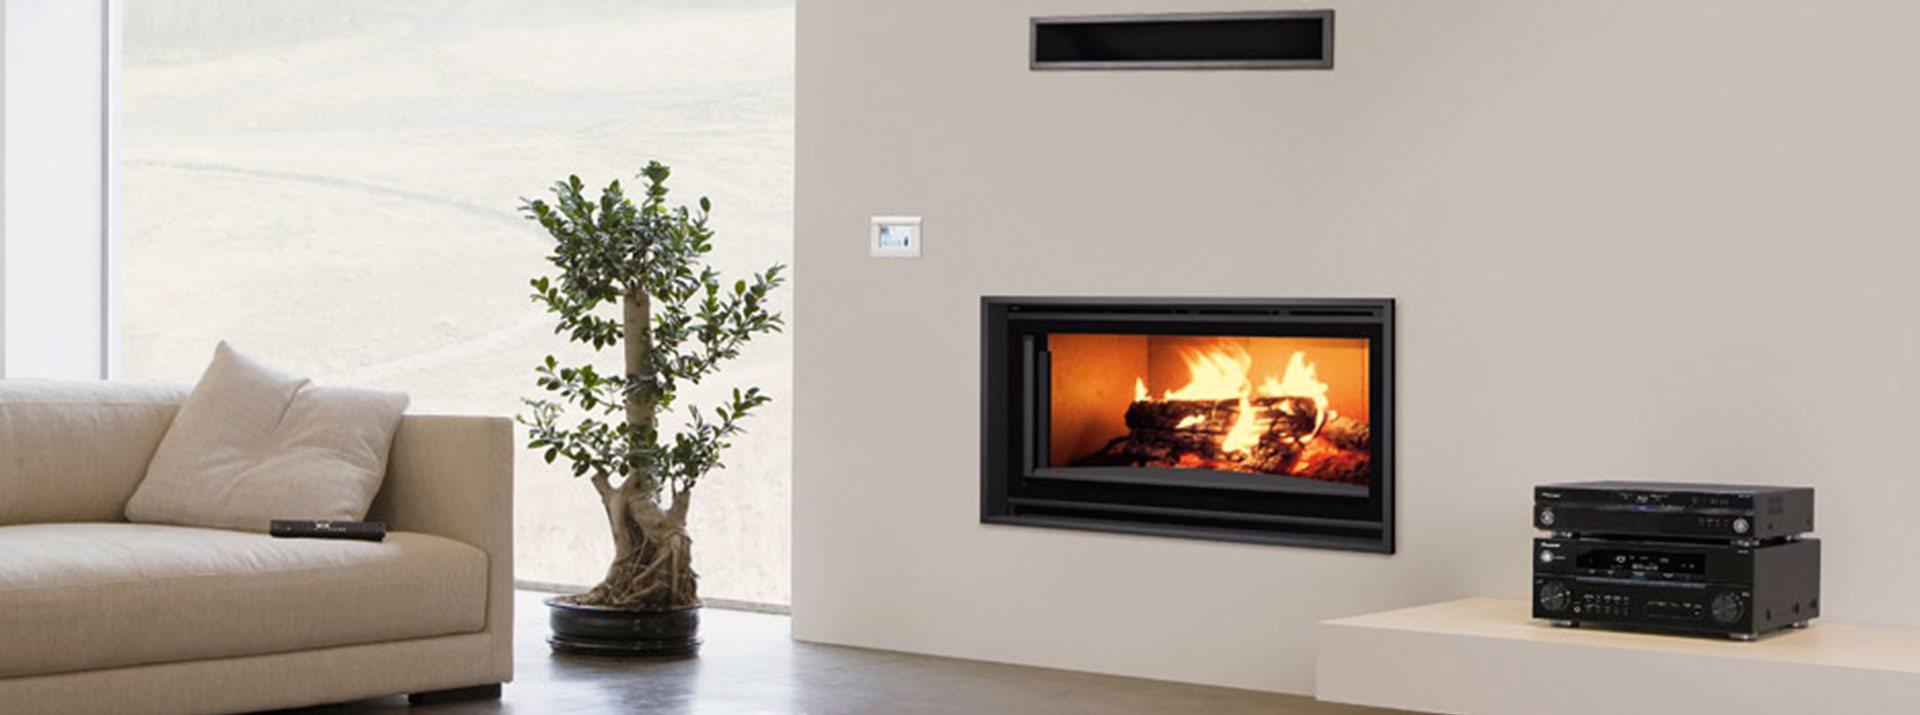 Carbel chimeneas y estufas de le a for Diseno de hogares a lena modernos